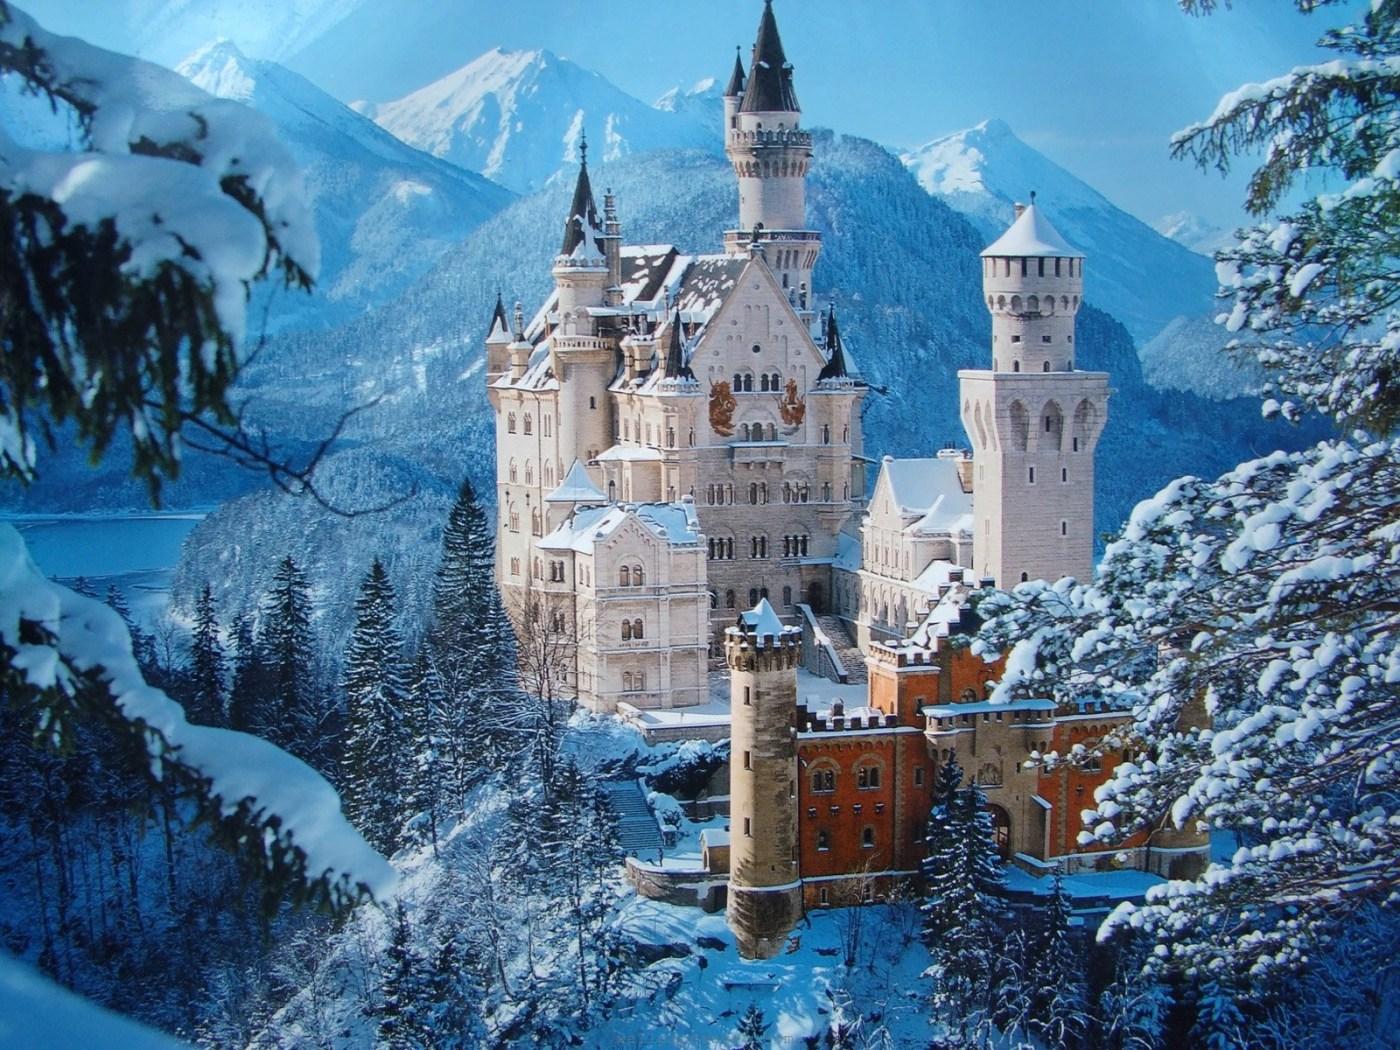 Unique Wallpaper The Great Neuschwanstein Castle Germany Wallpaper 1400x1050